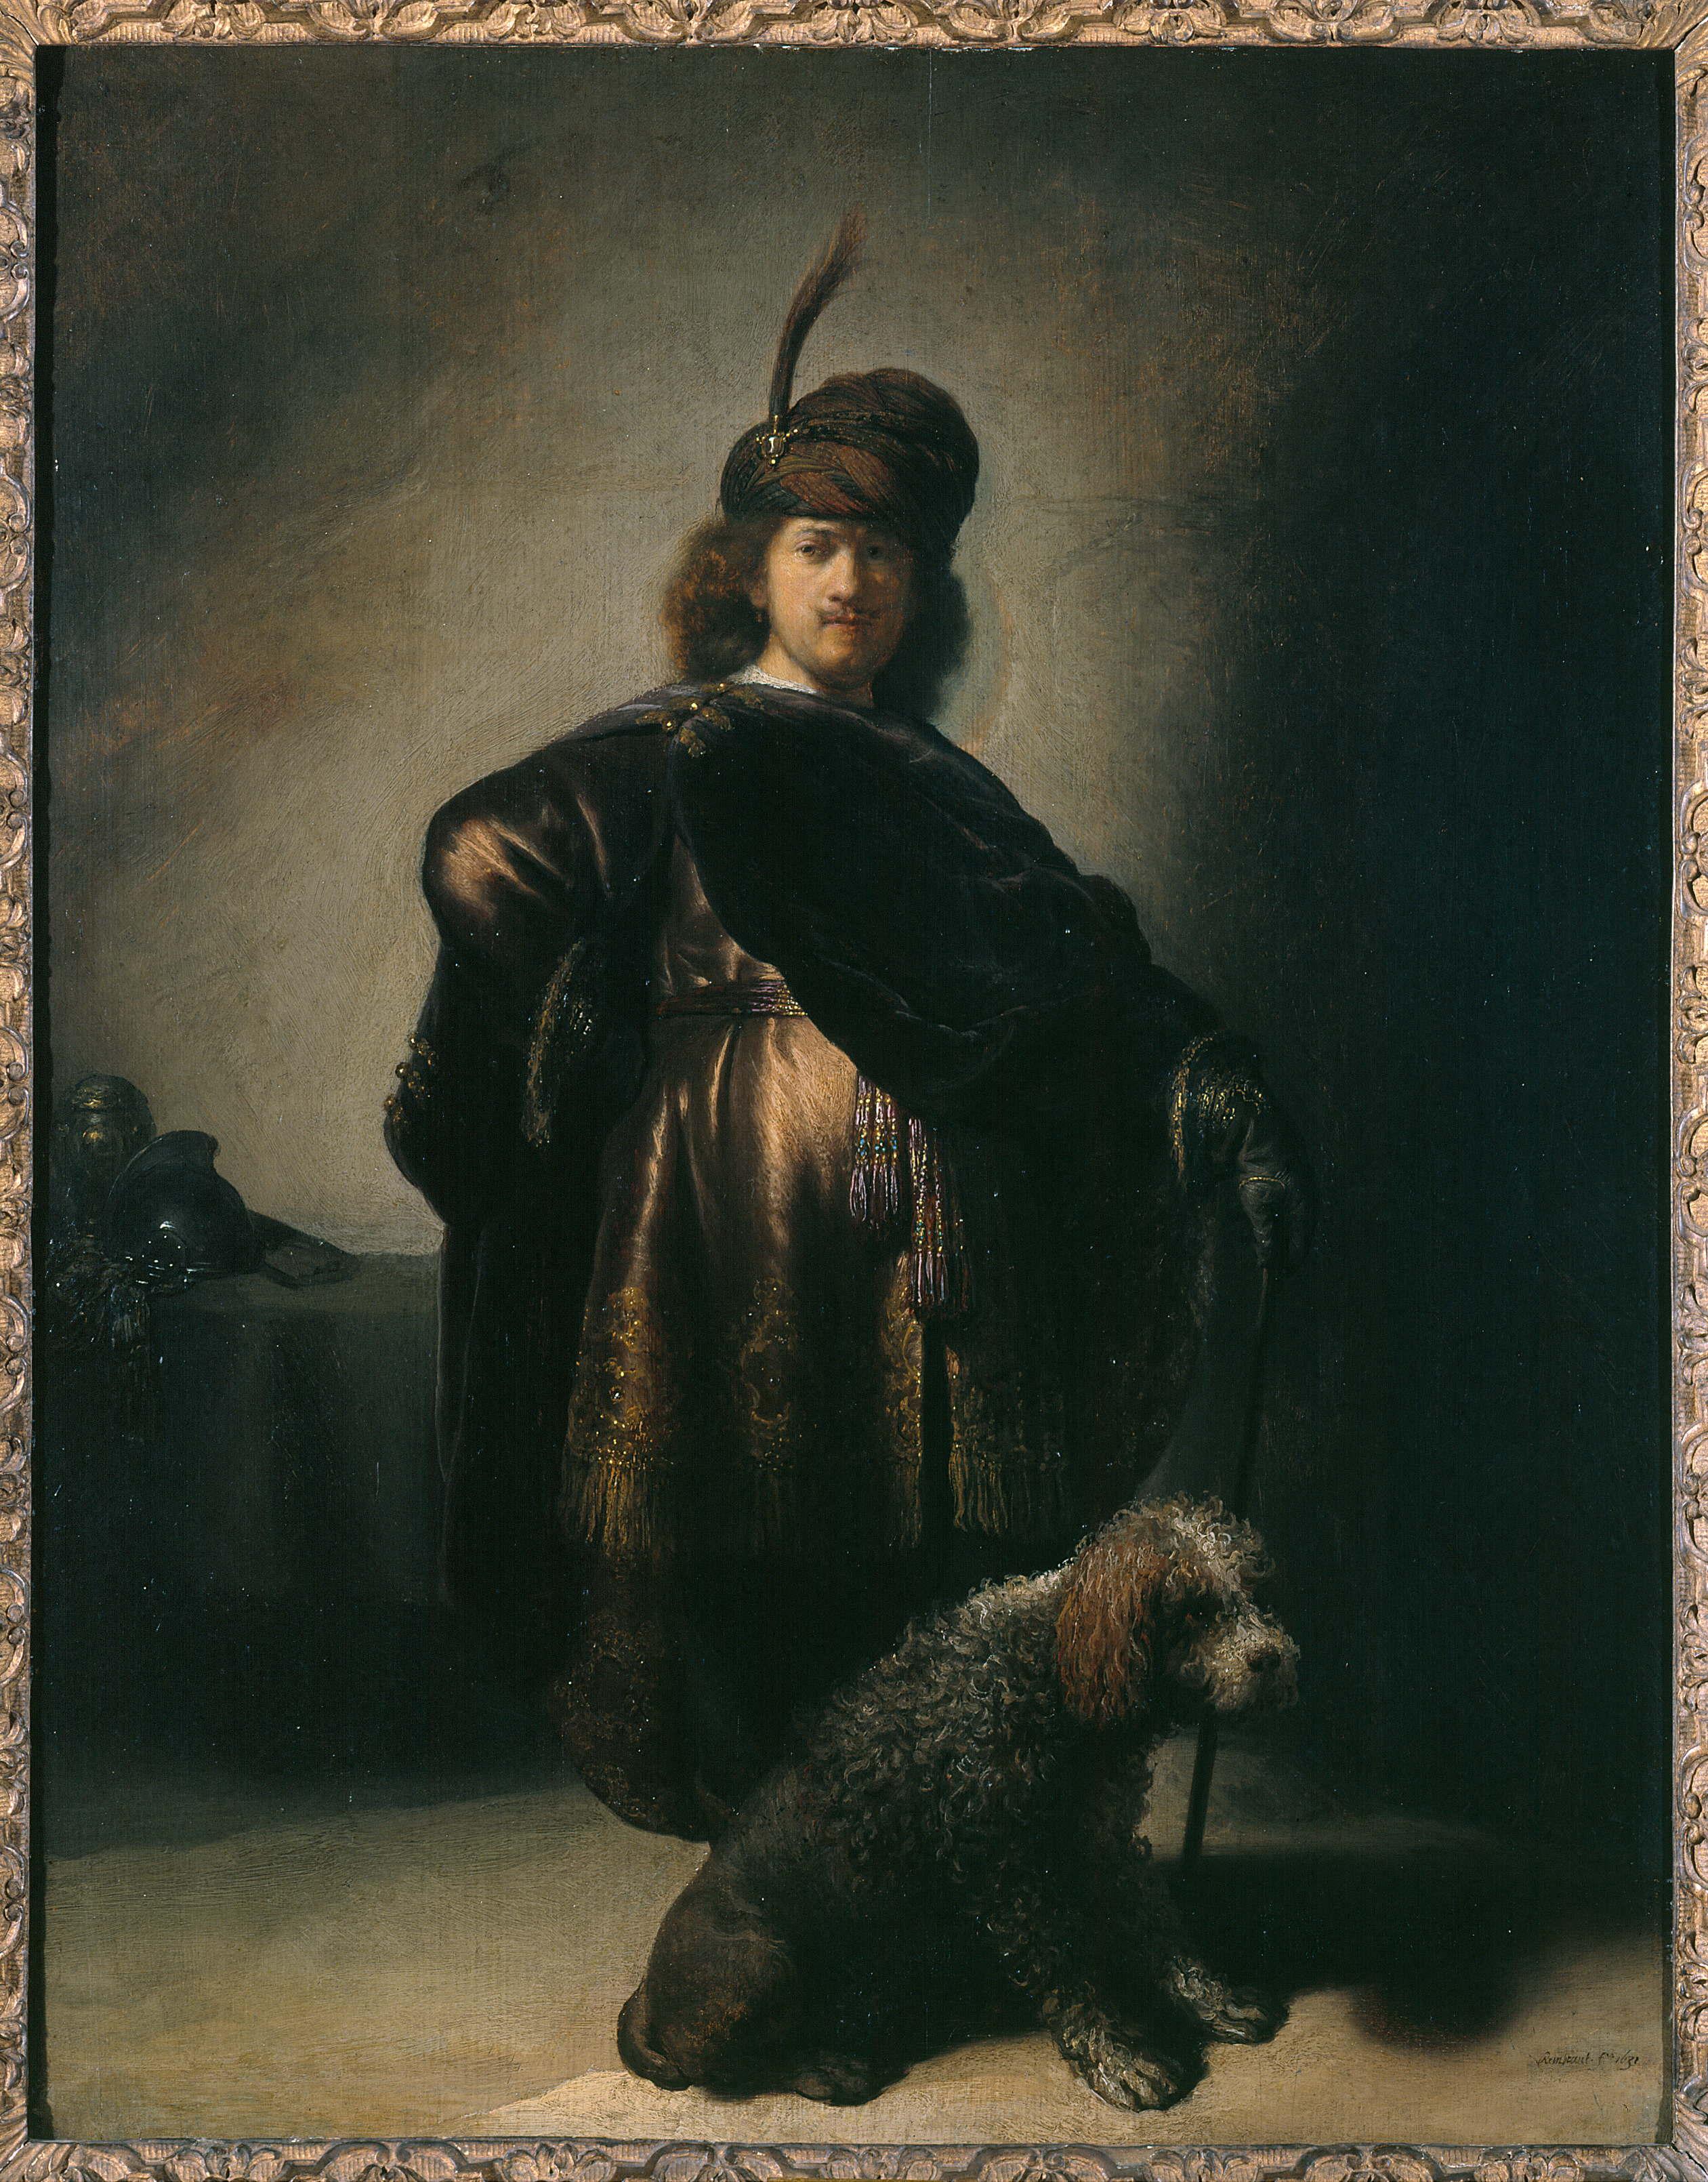 a biography of rembrandt van rijn Rembrandt harmenz van rijn, born july 15, 1606 in leiden, was the son of a miller, harmen gerritz van rijn (1568-1630), and his wife neeltgen van zuytbrouck (1568-1640) the youngest son of a least ten children, rembrandt was not expected to carry on his father's business since the family was .